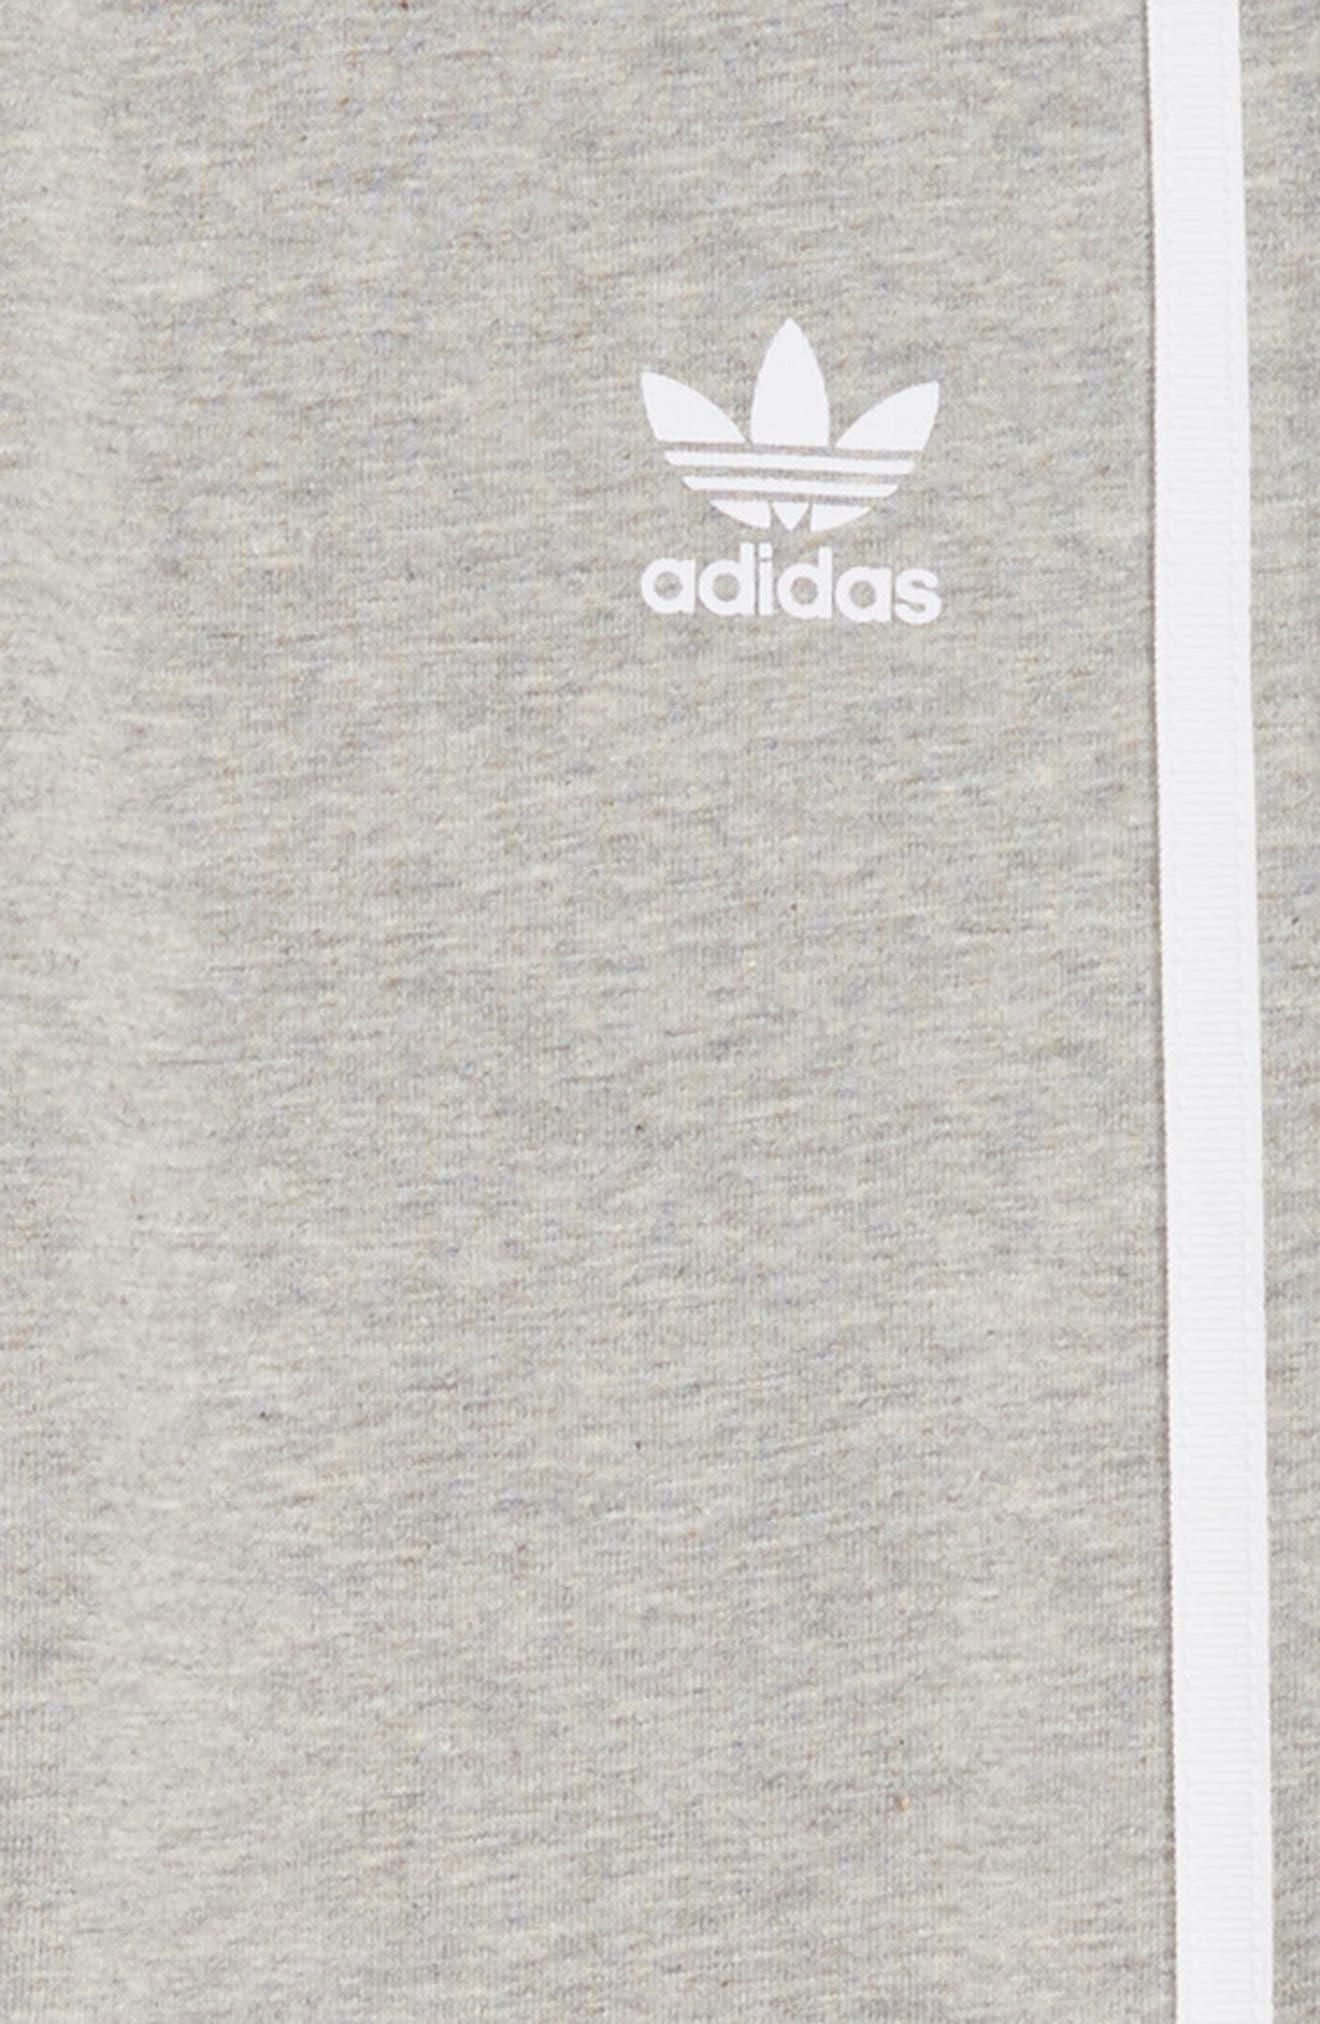 ADIDAS ORIGINALS, adidas 3-Stripes Leggings, Alternate thumbnail 2, color, 035